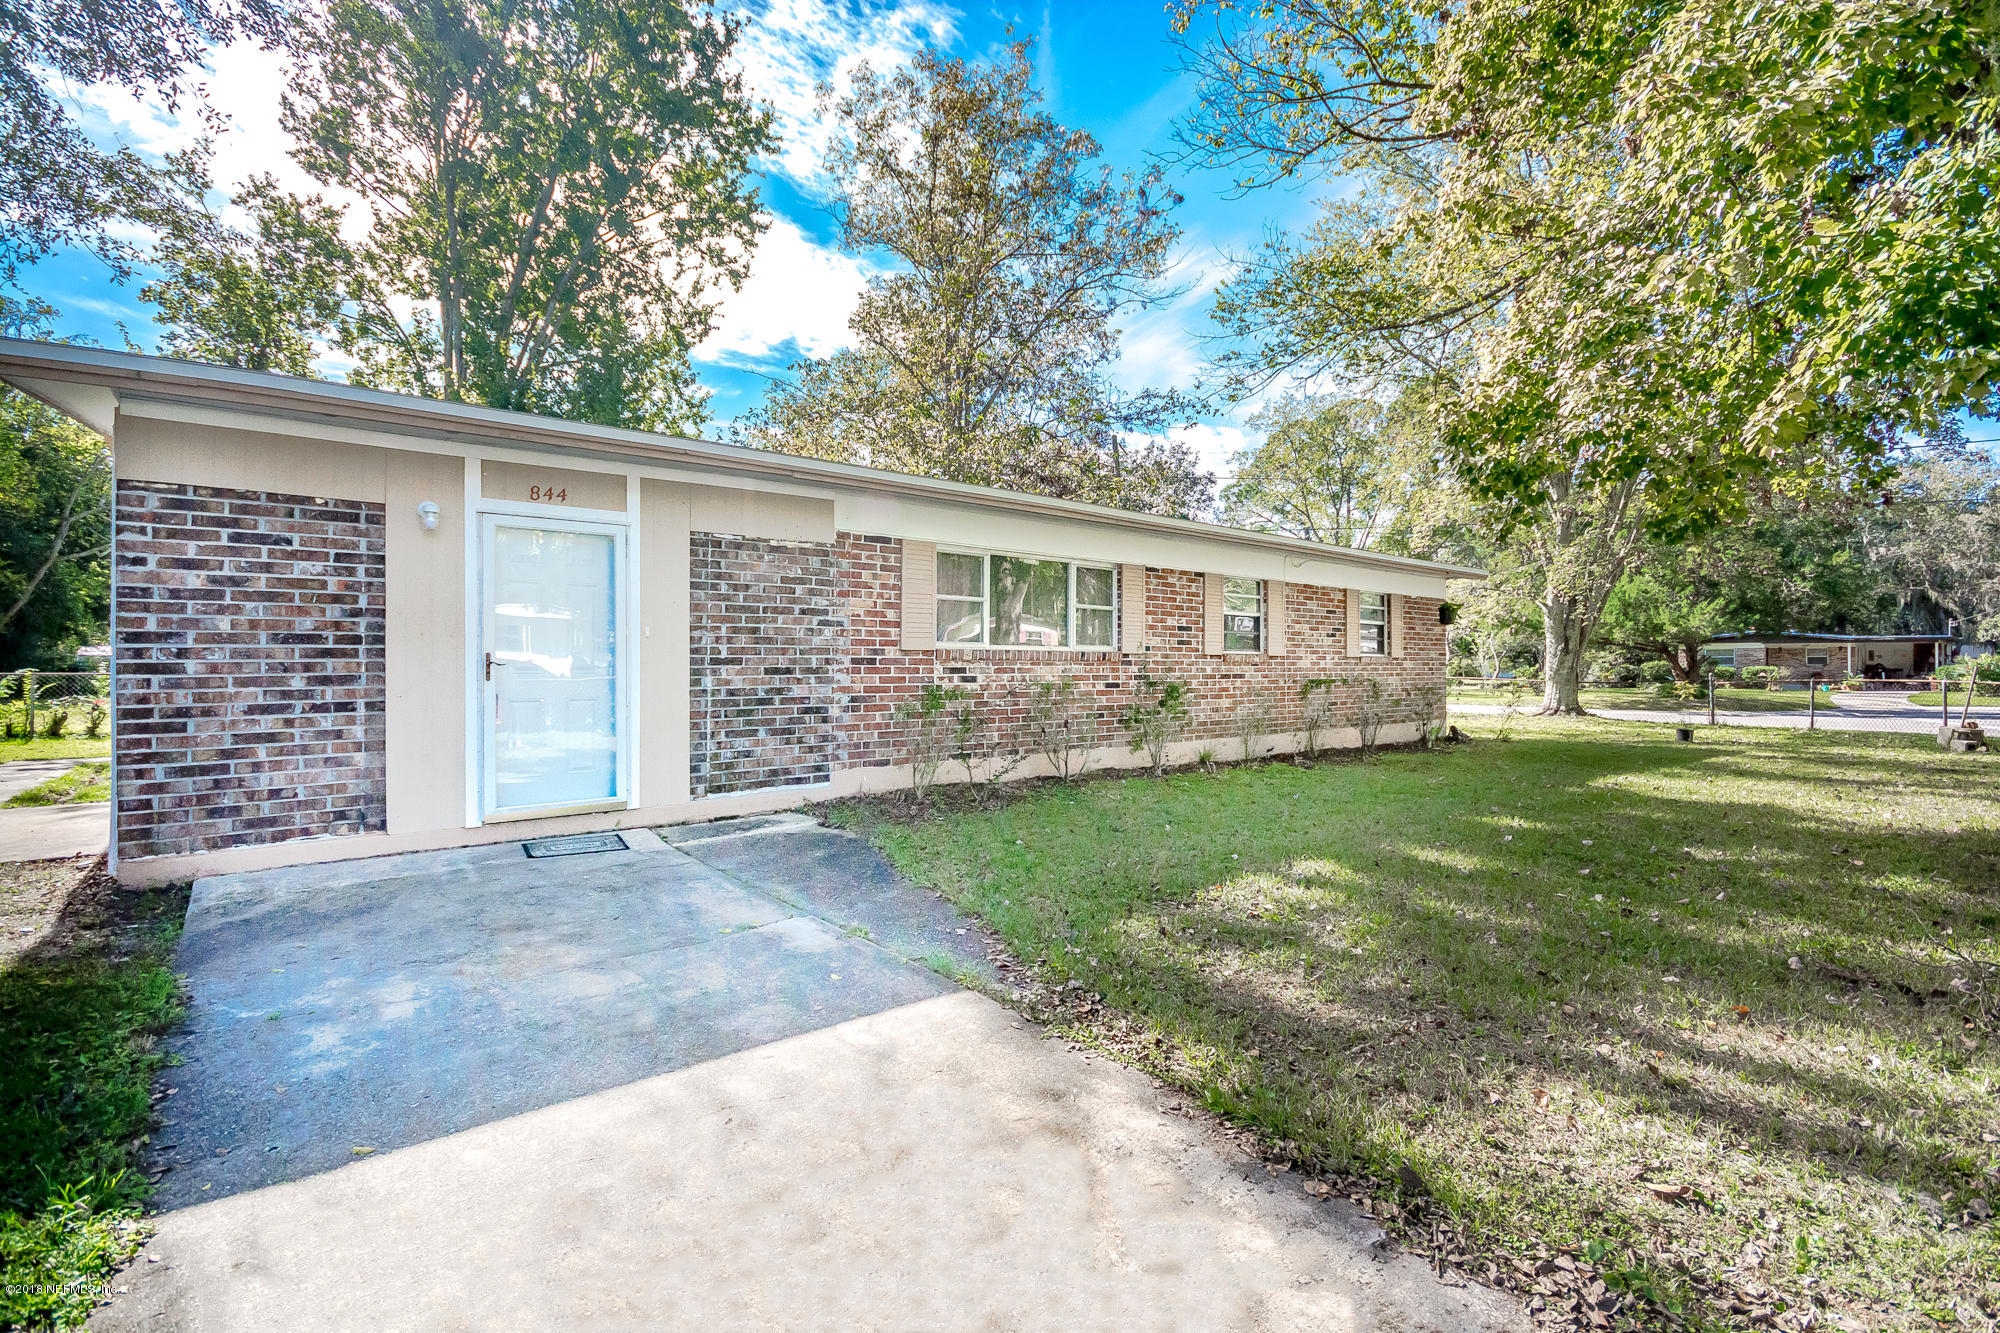 844 FLOYD, ORANGE PARK, FLORIDA 32073, 3 Bedrooms Bedrooms, ,1 BathroomBathrooms,Residential - single family,For sale,FLOYD,967672